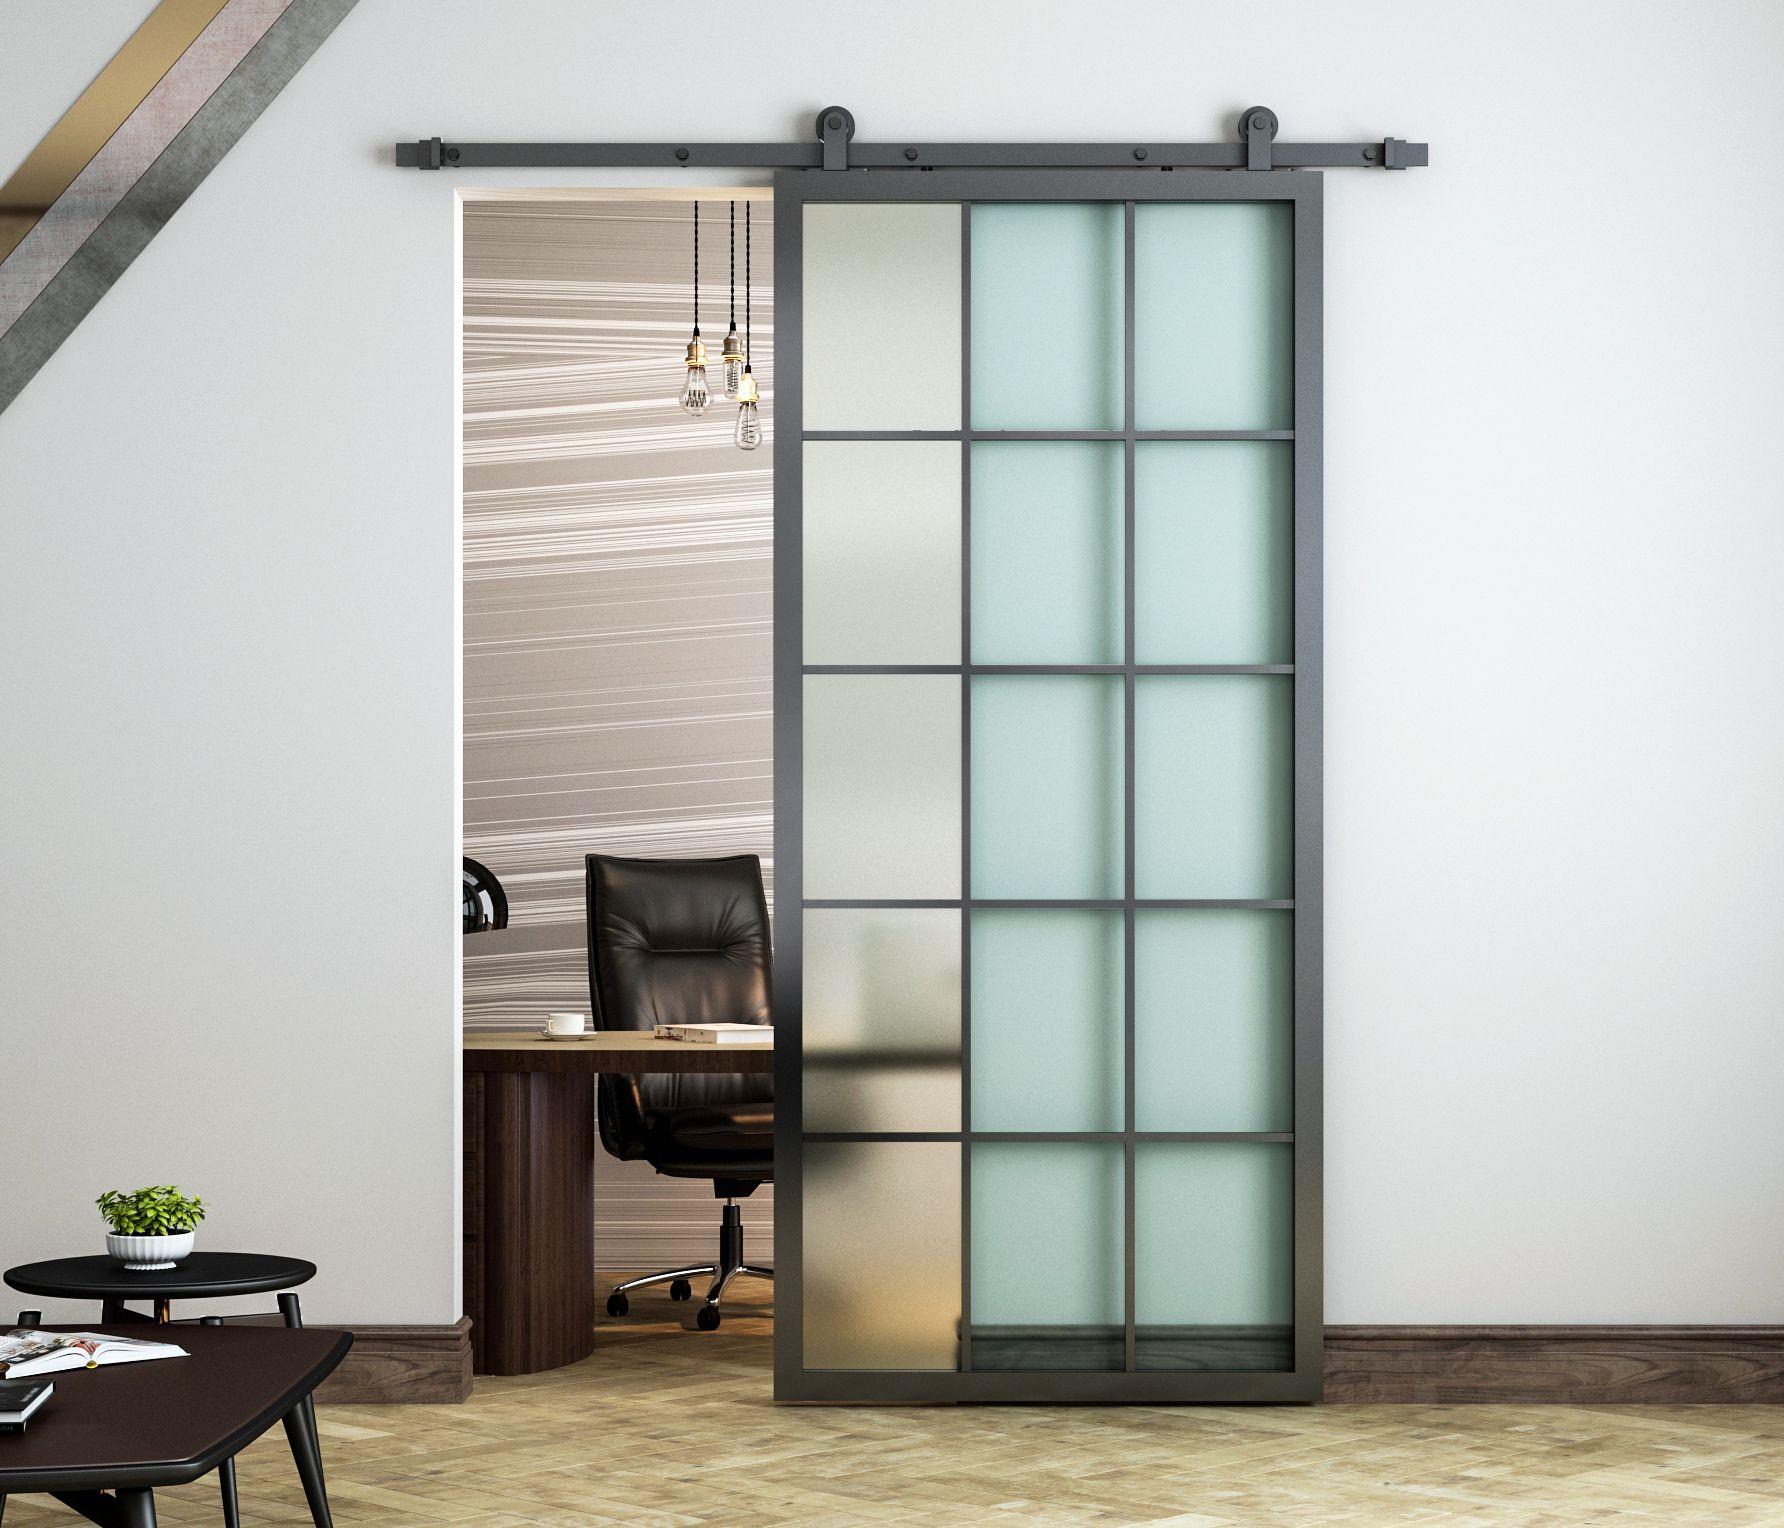 "DIYHD 36x84 ""أسود الألومنيوم الإطار الزجاج انزلاق الباب البحارة لوحة الداخلية واضحة لوحة مقسى زجاج الباب قسم الباب (تفكيك)"